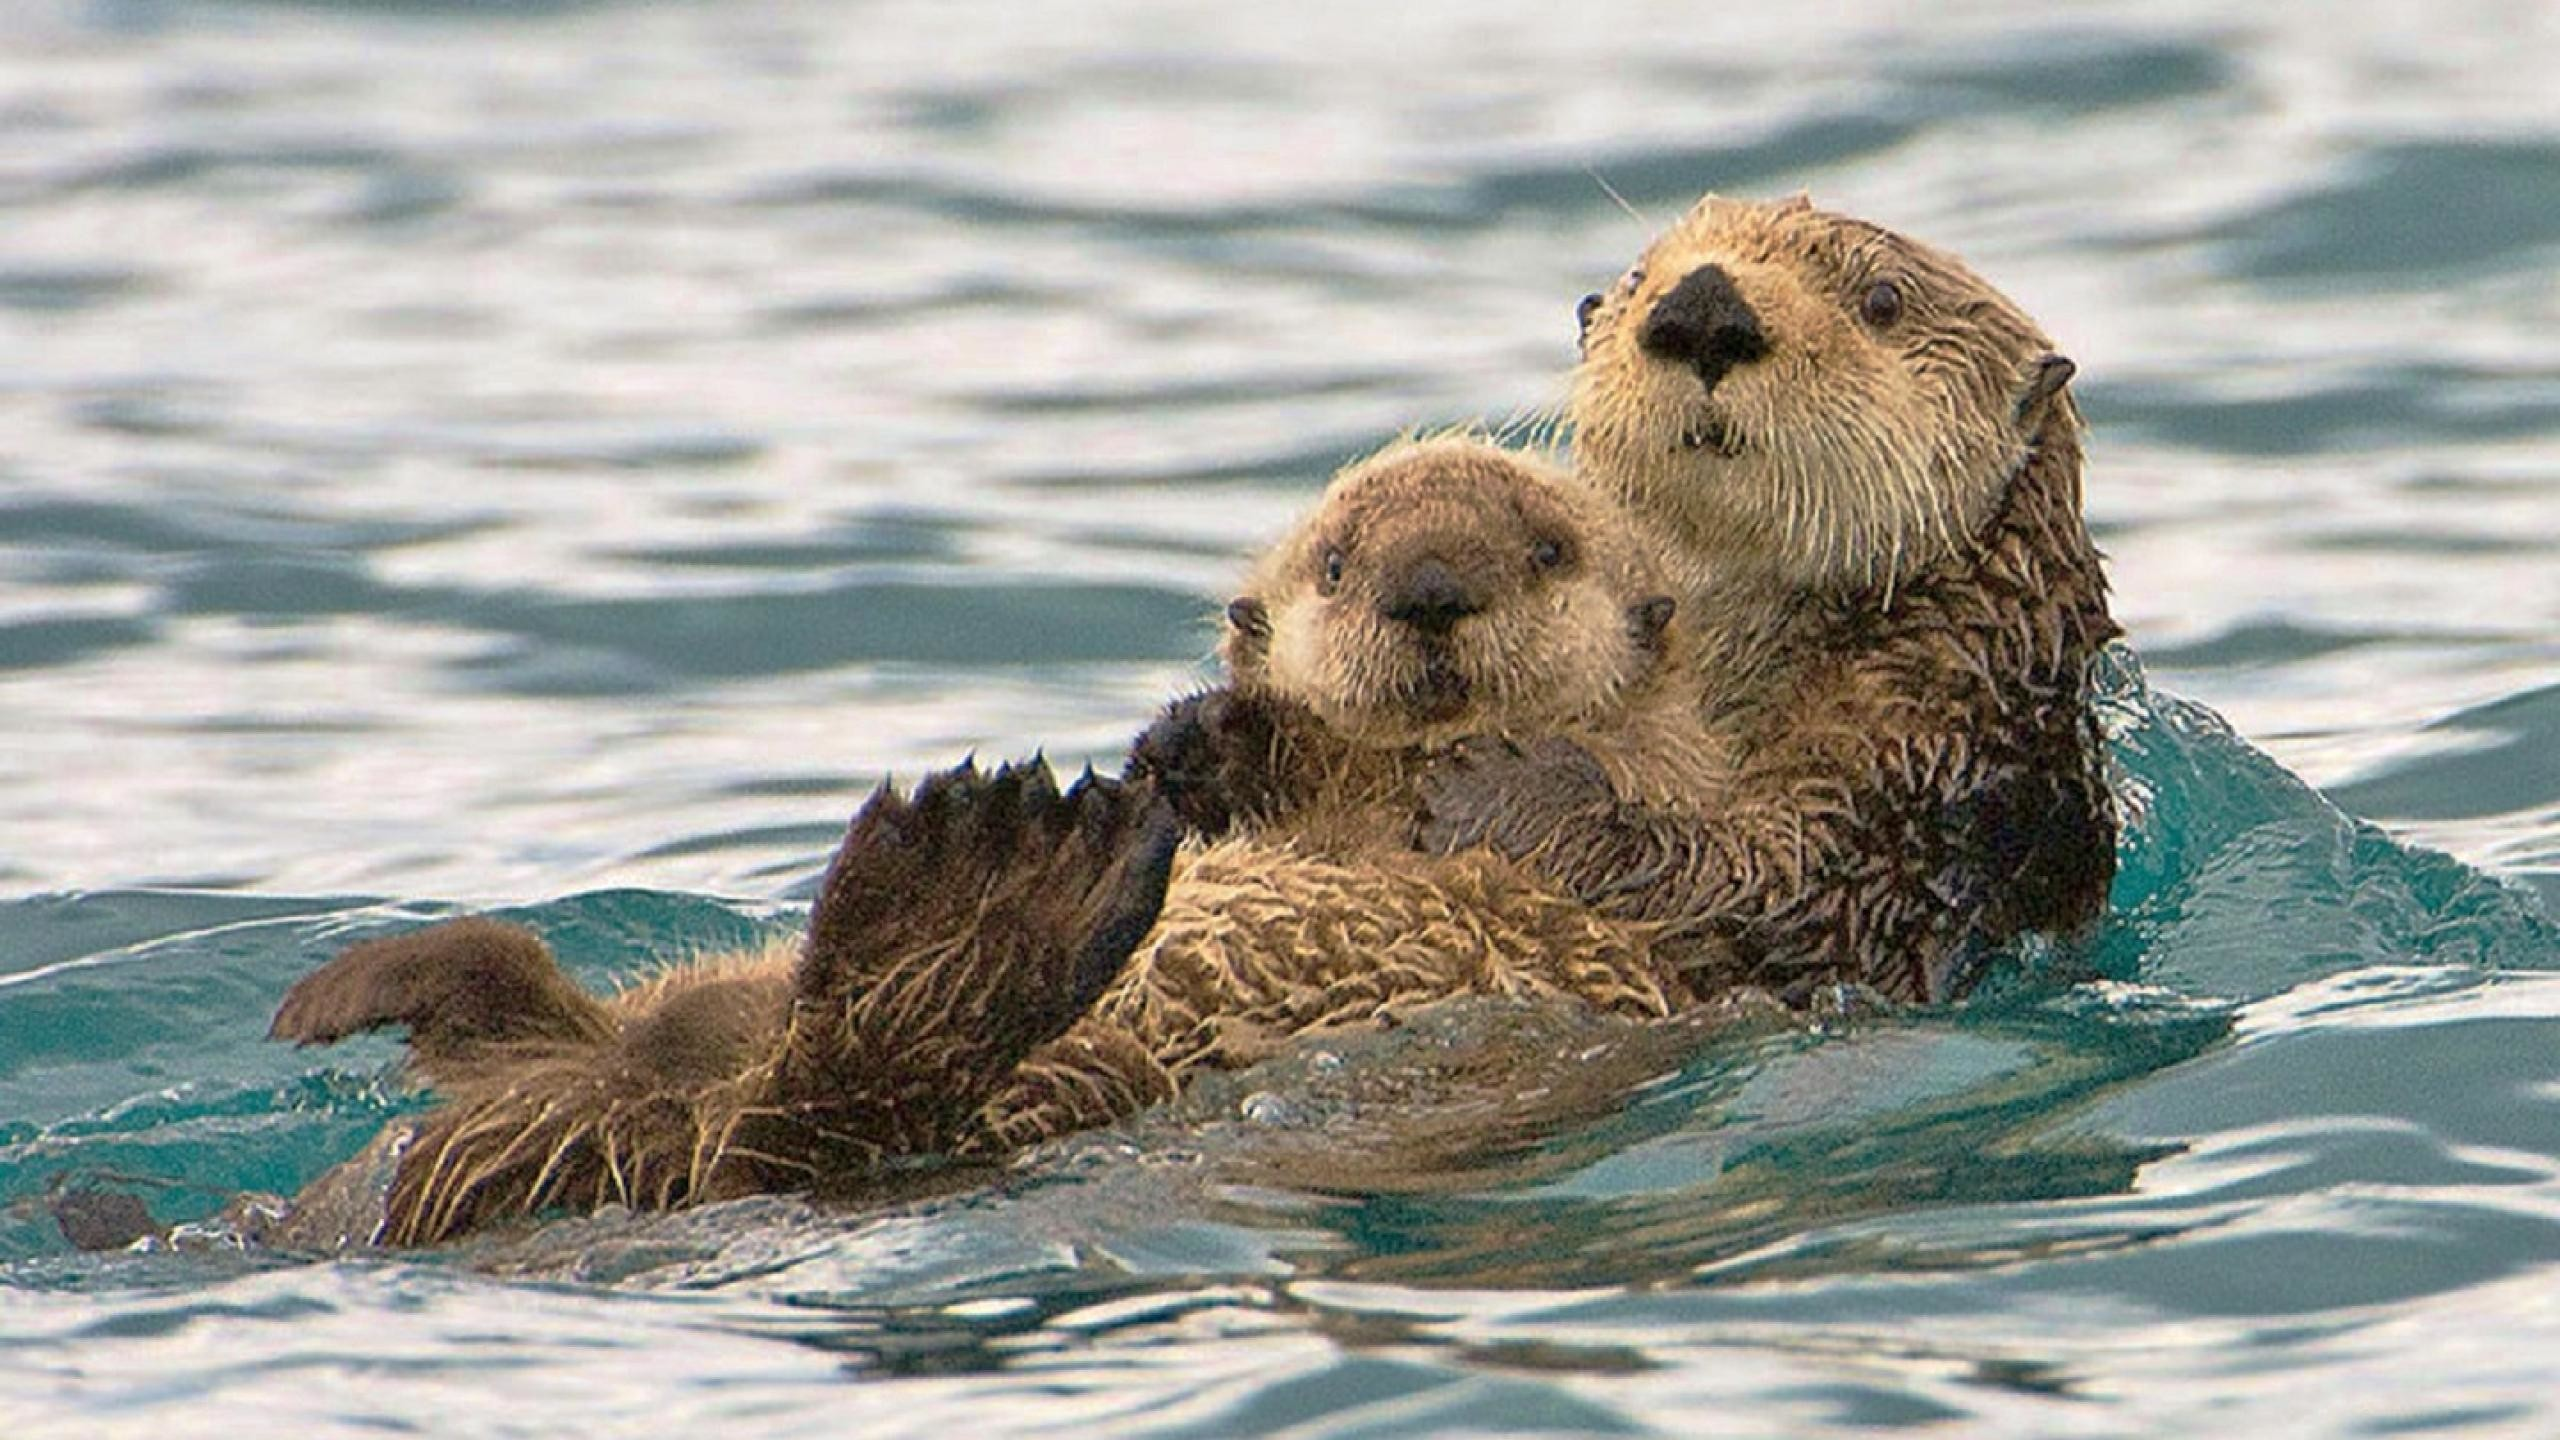 Sea Otter Wallpaper 52 Images